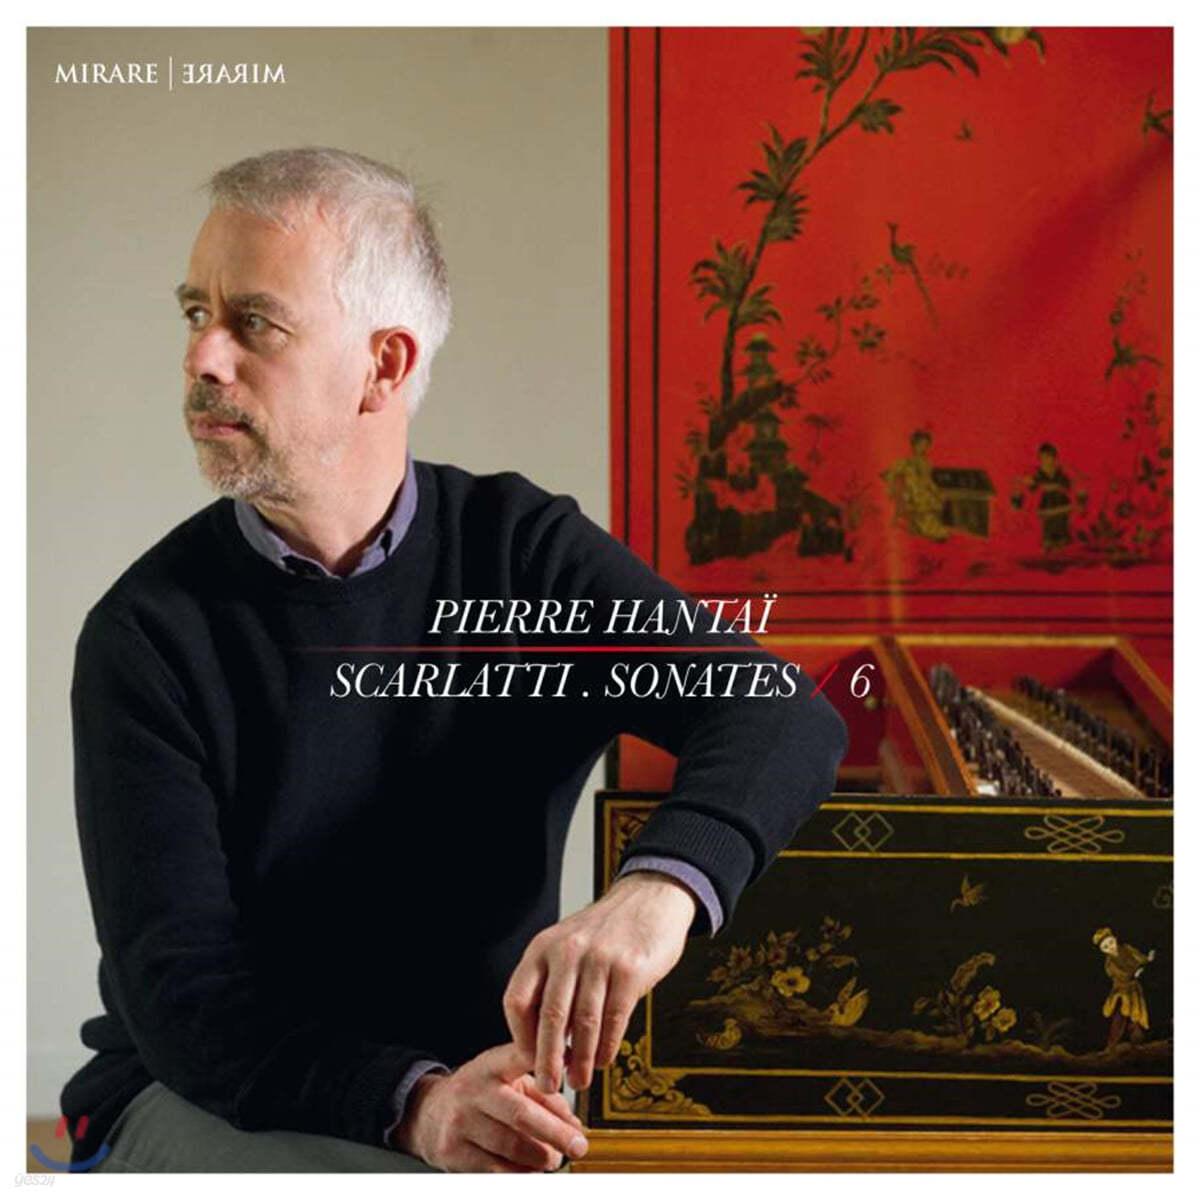 Pierre Hantai 스카를라티: 하프시코드 소나타 6집 - 피에르 앙타이 (D. Scarlatti: Sonatas Vol. 6)